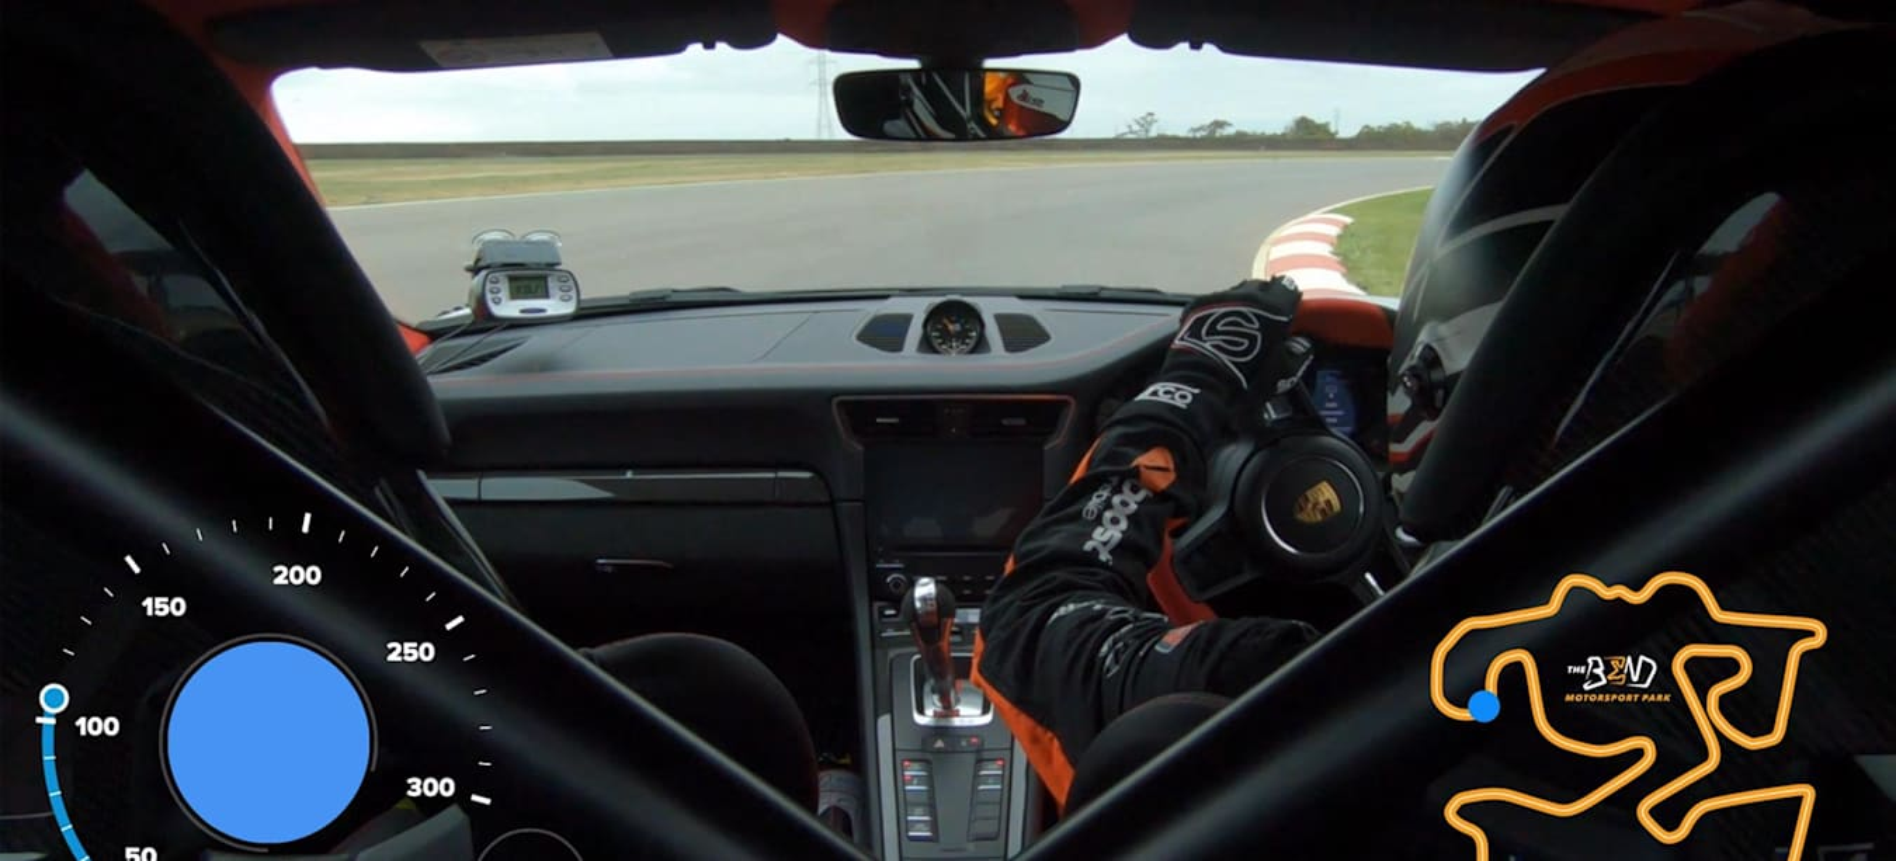 2018 Porsche 911 GT2 RS The Bend lap record video news